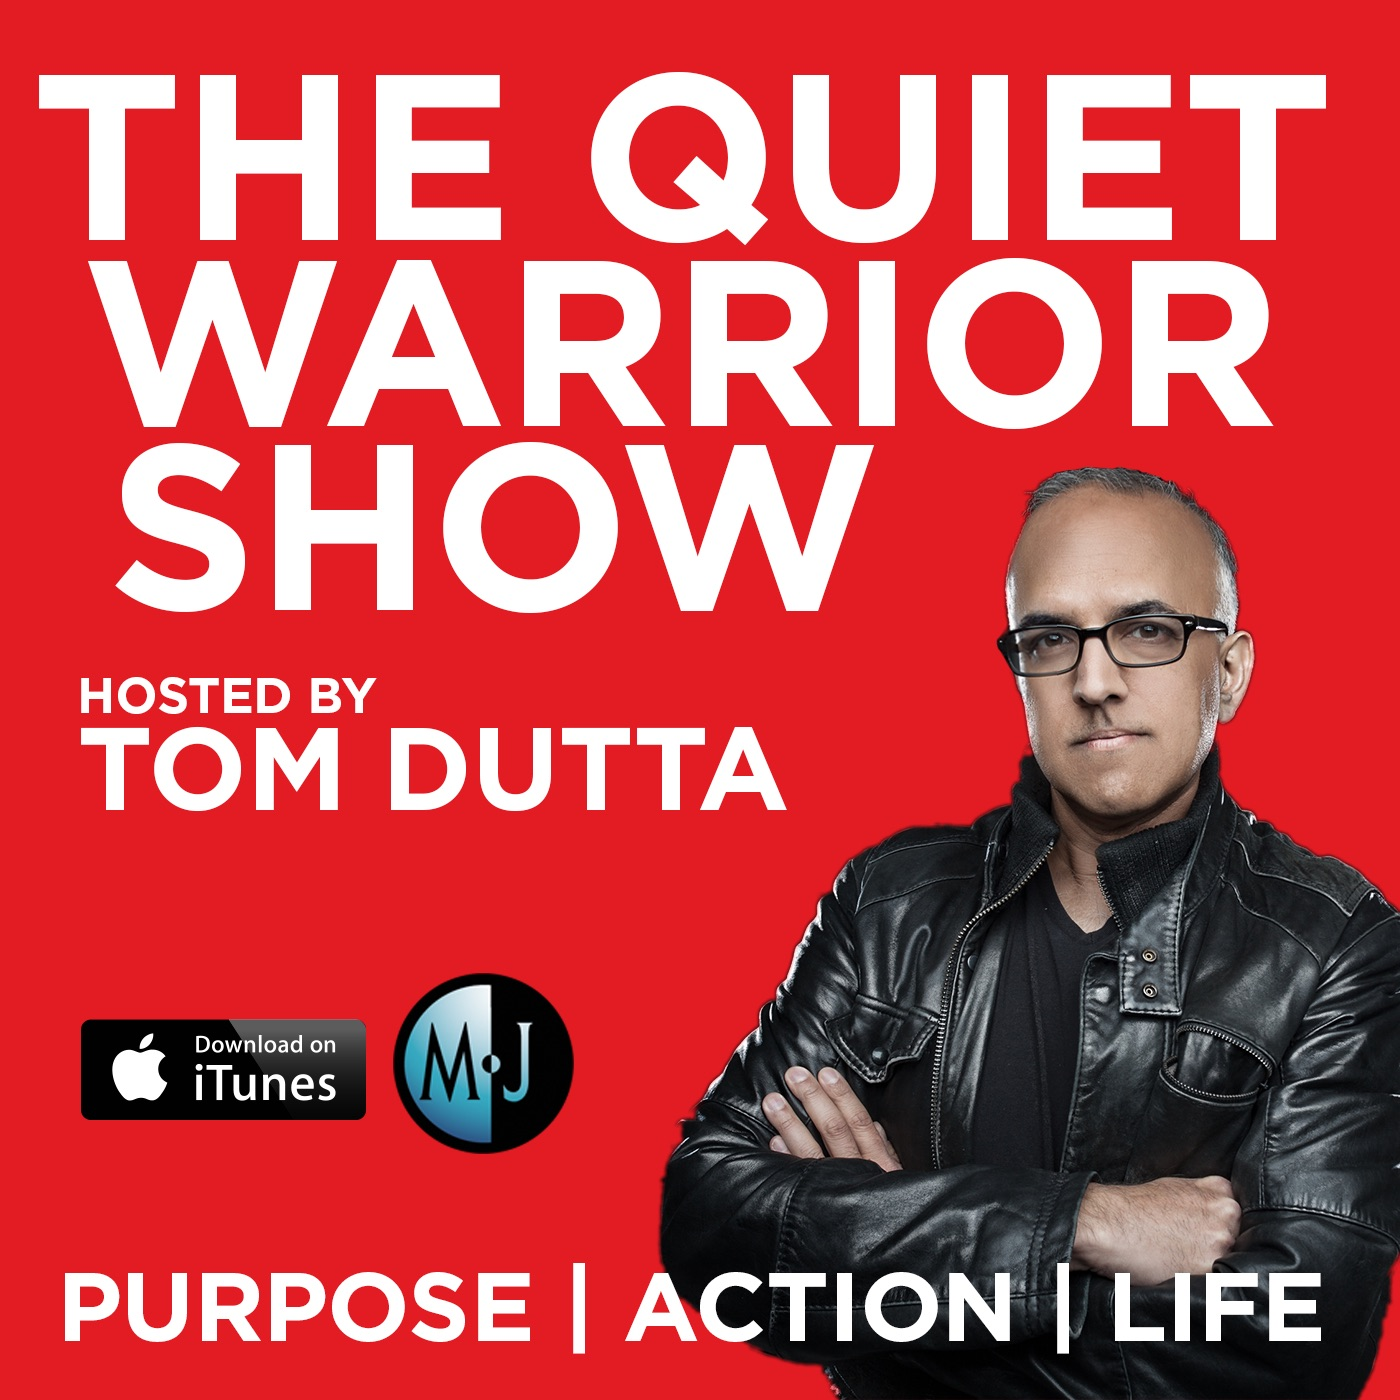 The Quiet Warrior Show show art